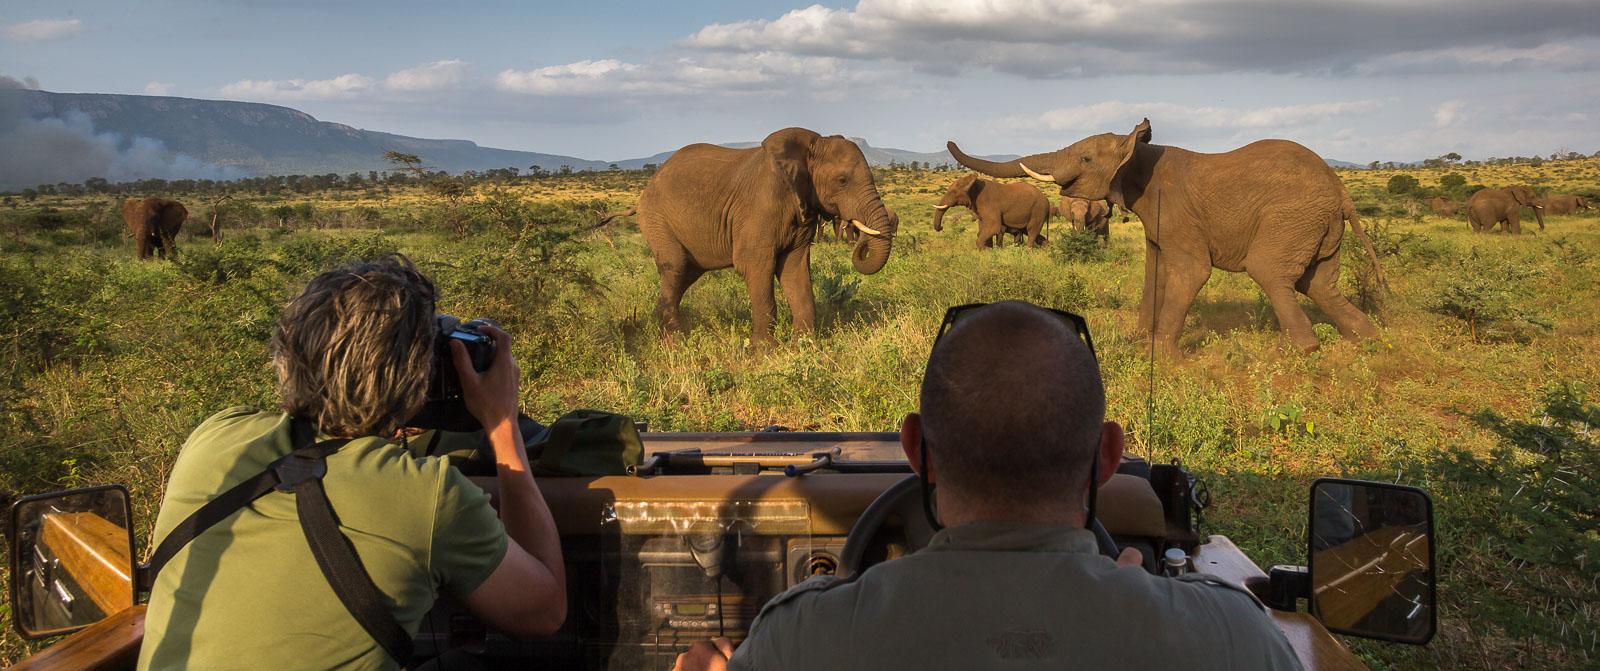 Elefantfotografering